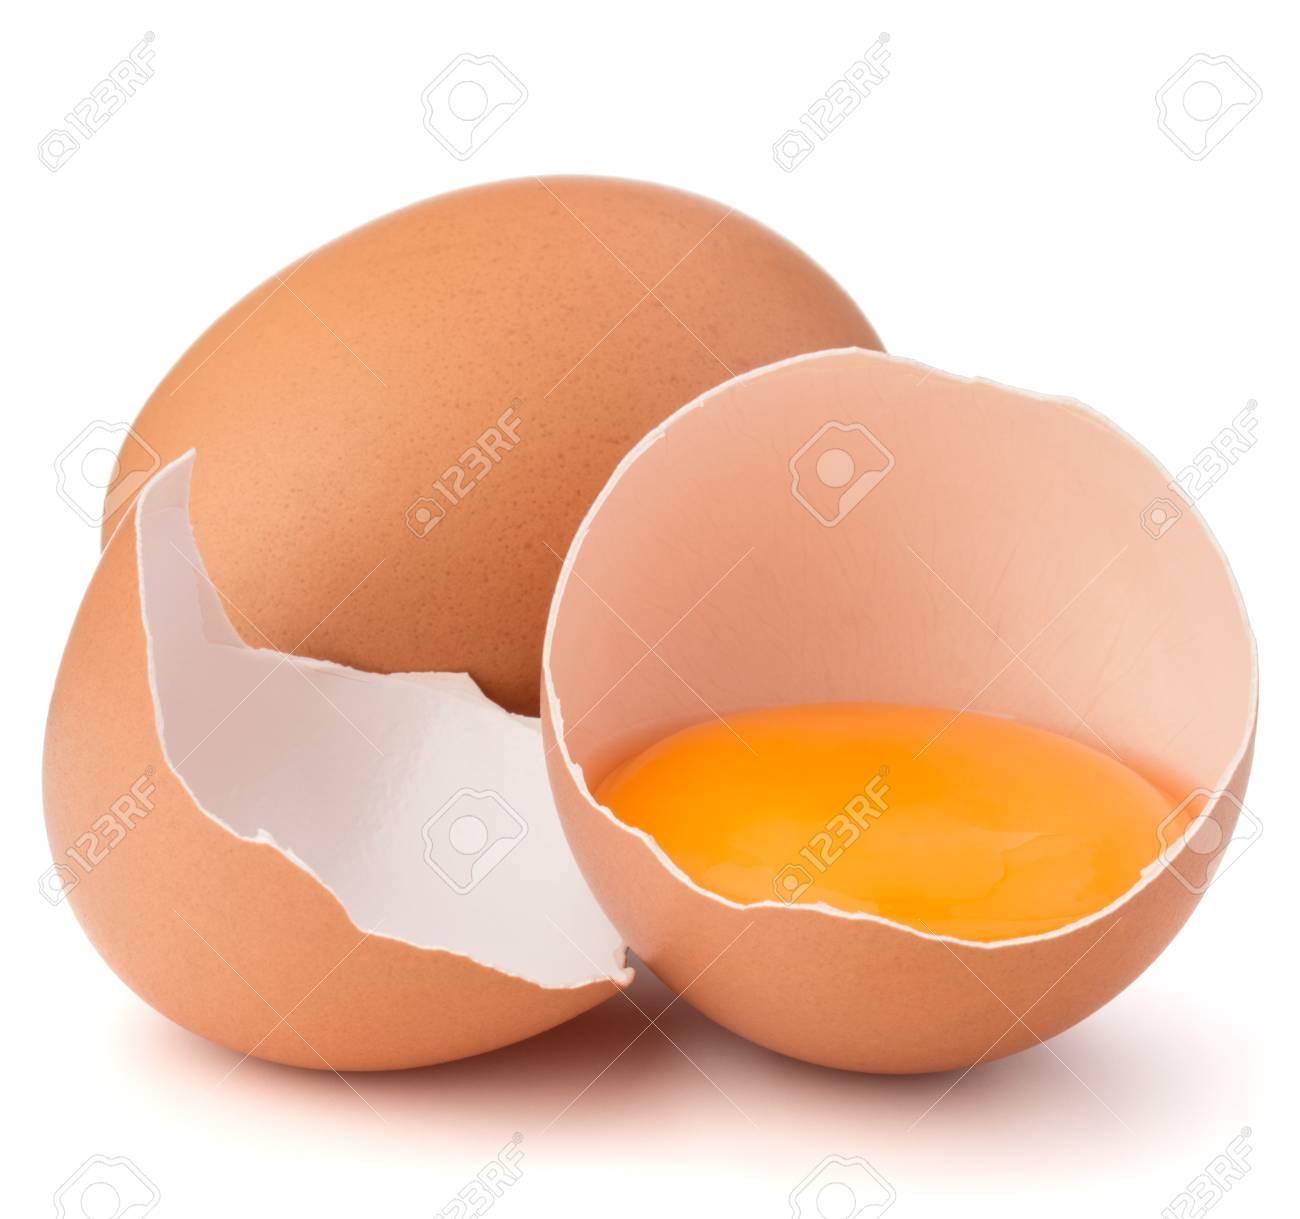 Broken Egg In Eggshell Half And Raw Egg Isolated On White Background